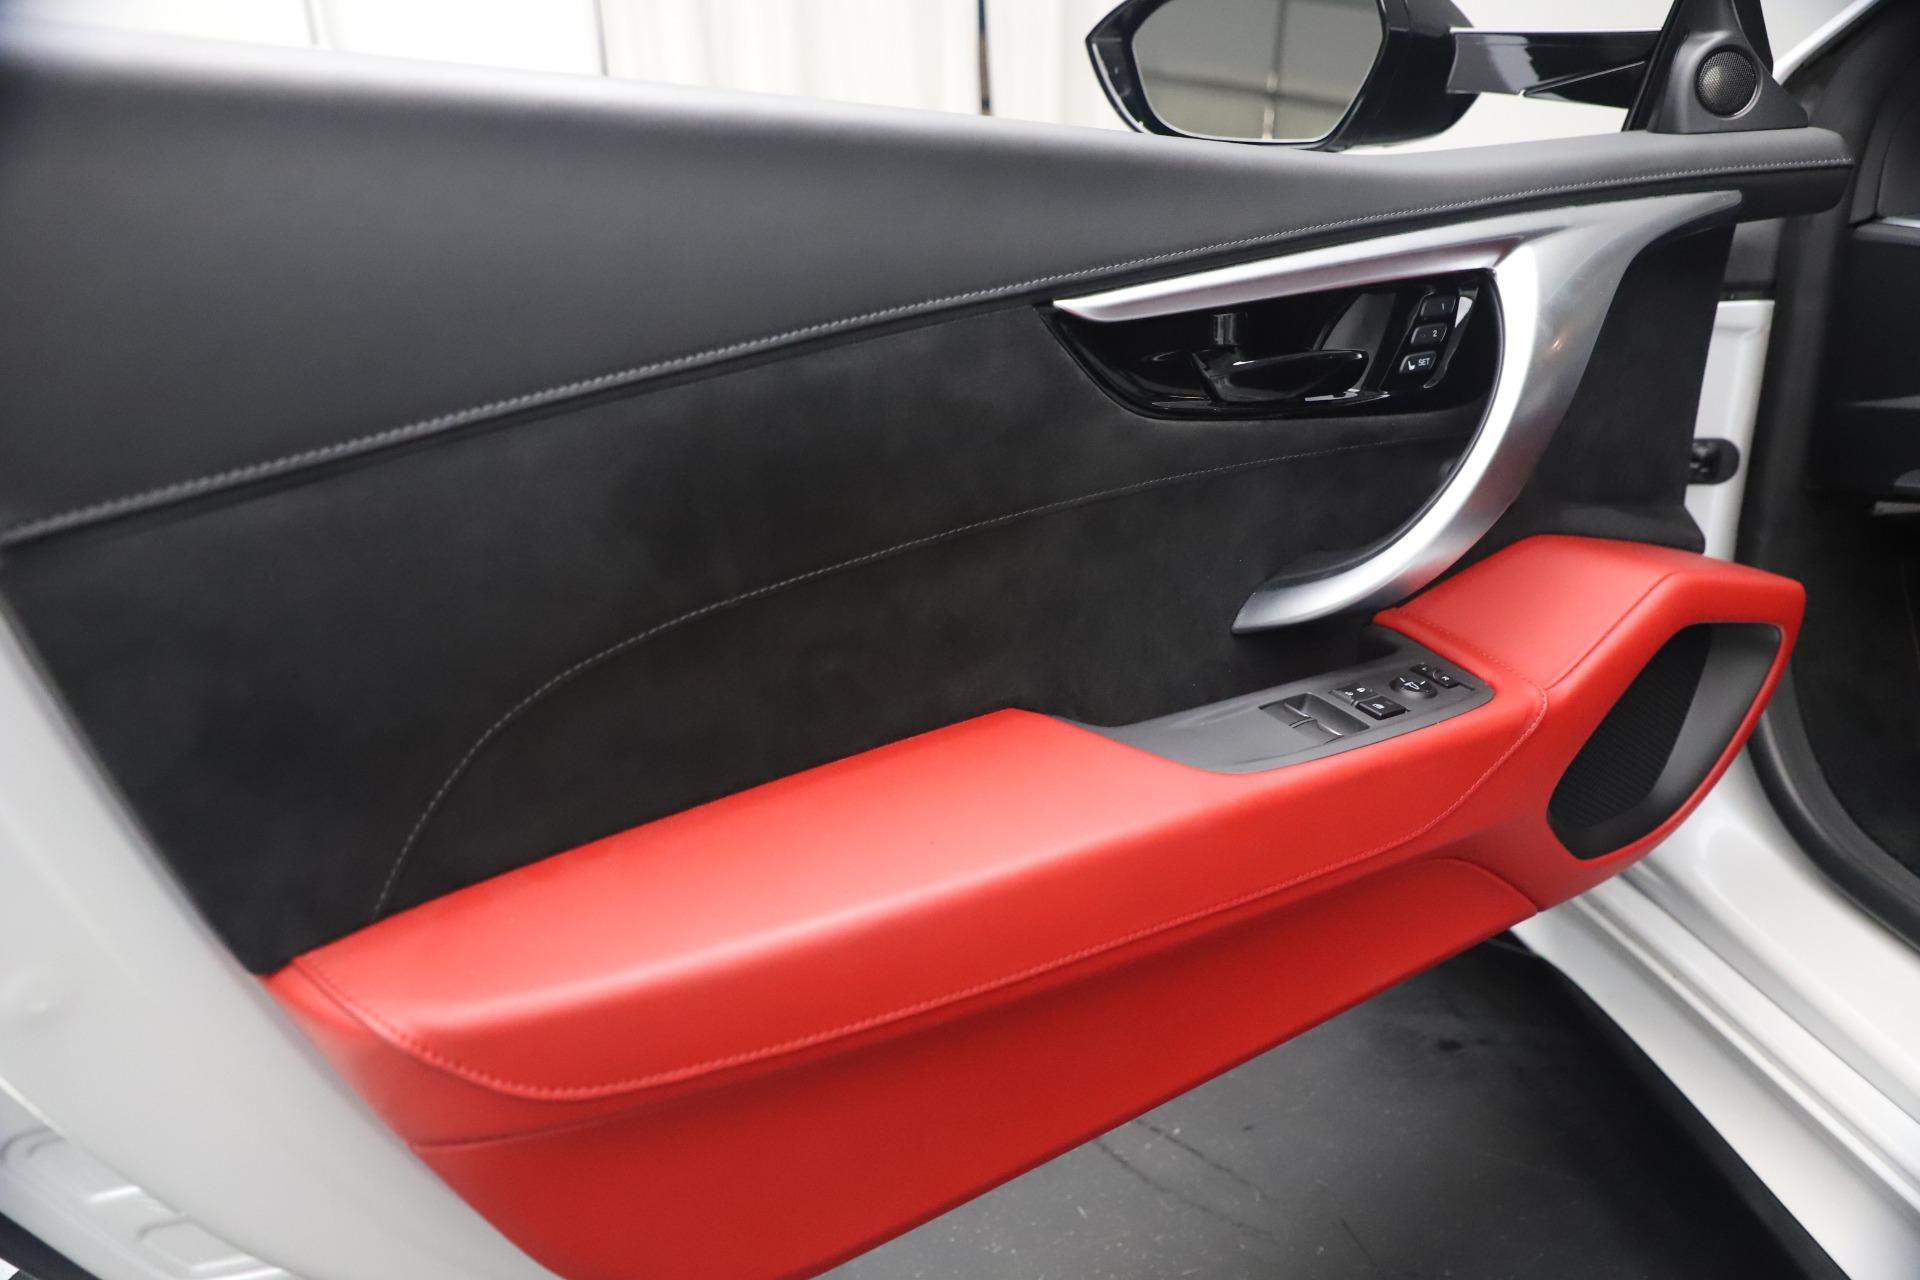 Used 2017 Acura NSX SH AWD Sport Hybrid